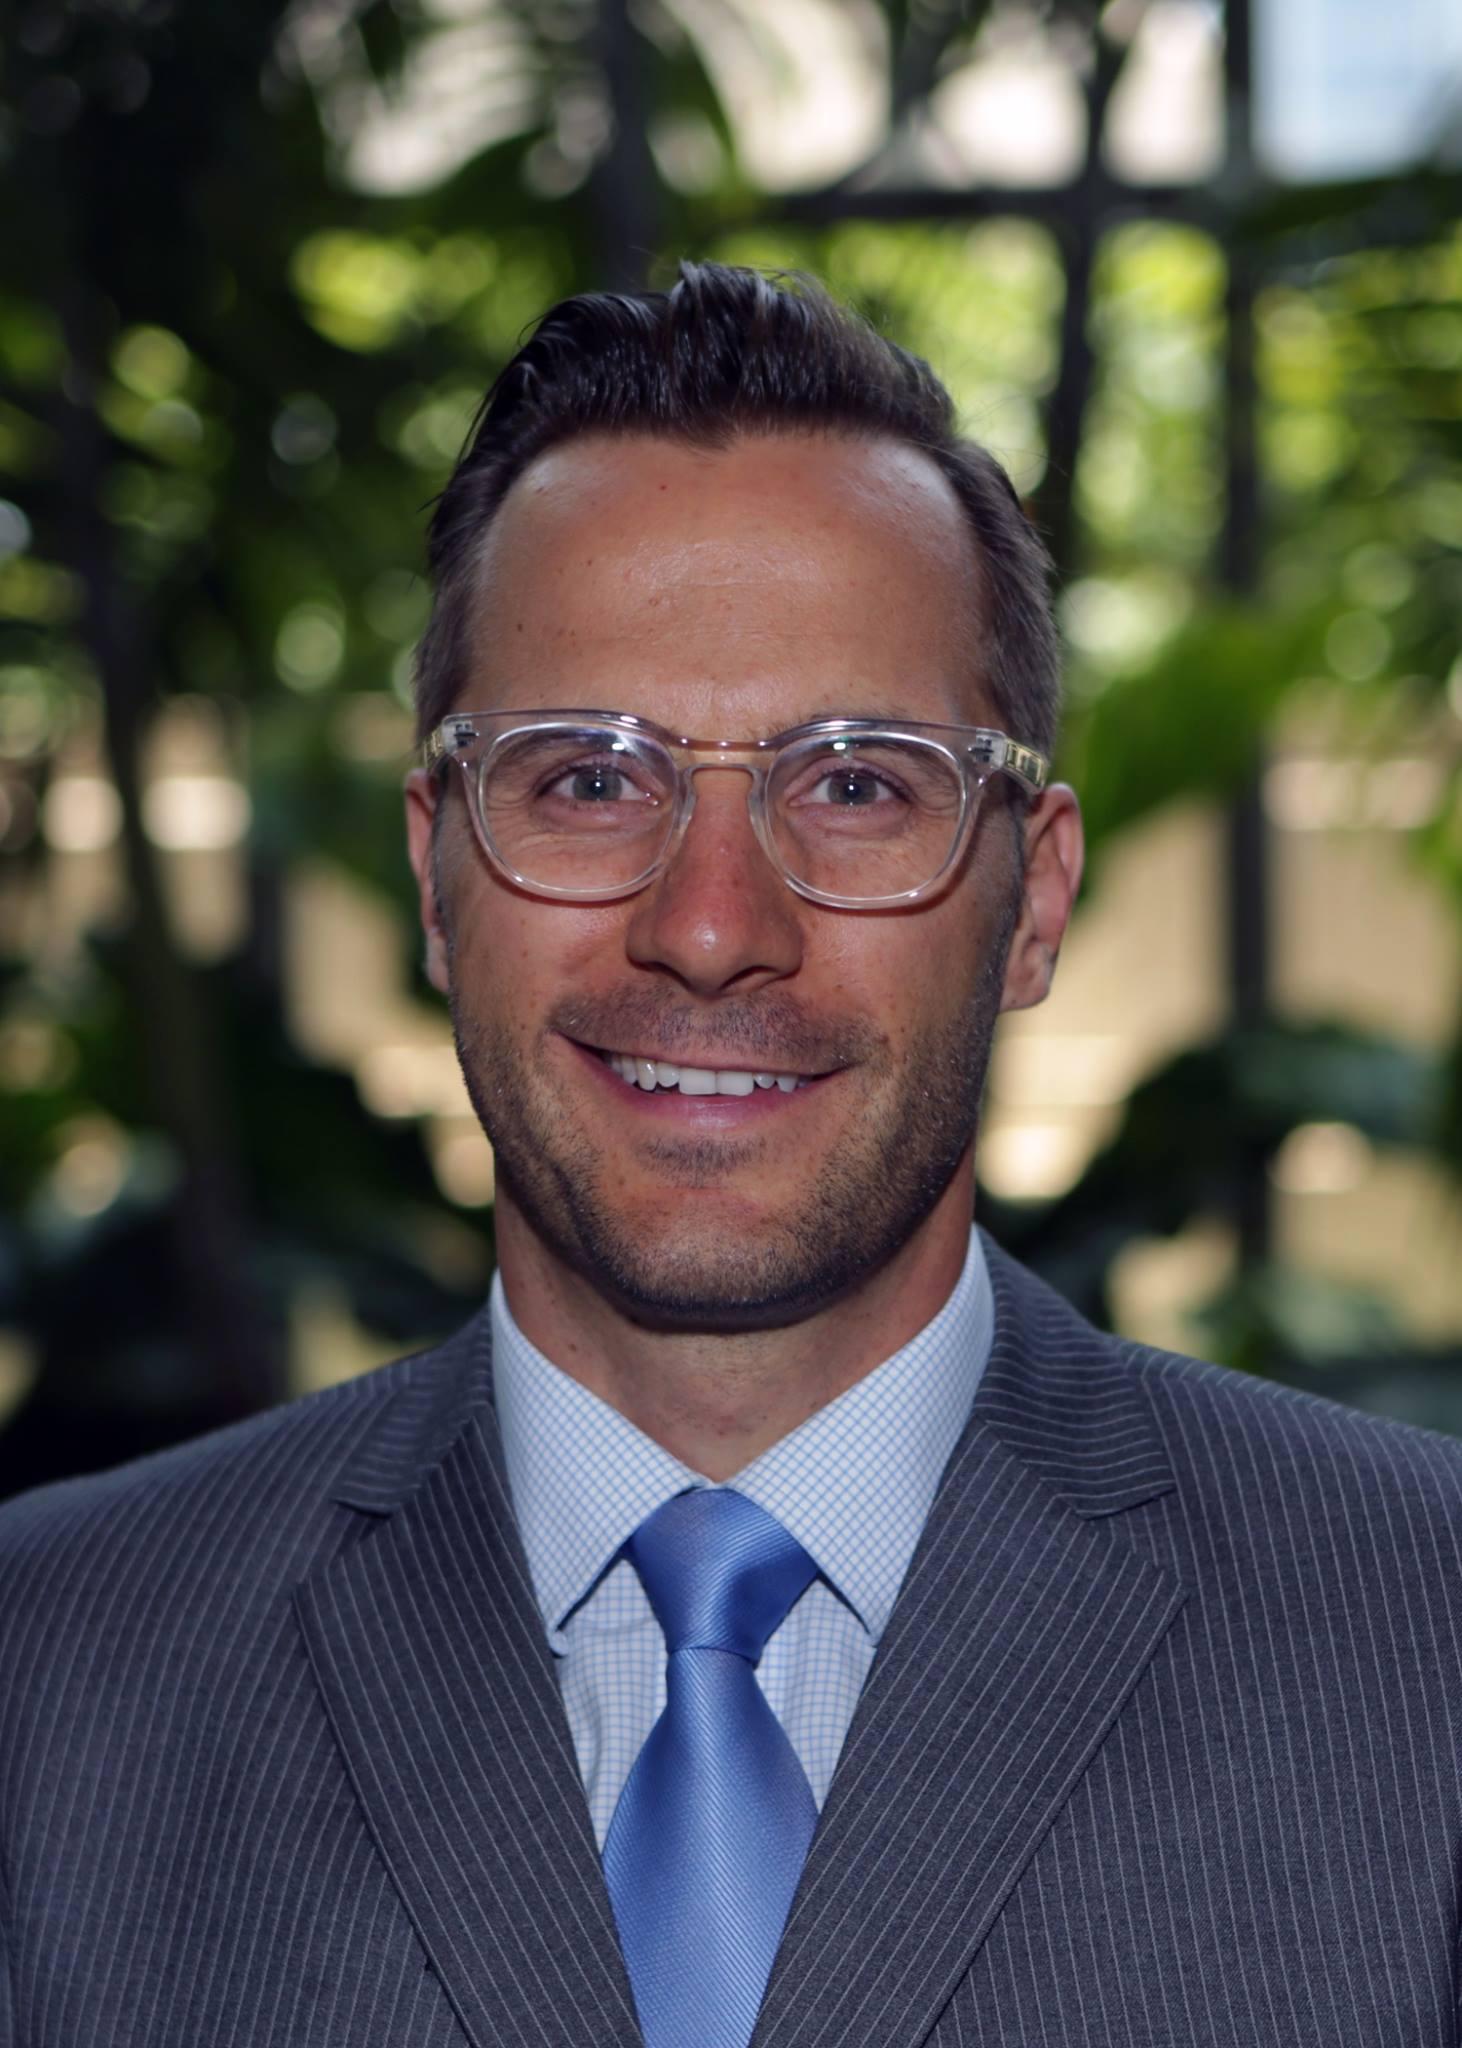 Shawn G. DuBravac, Ph.D., CFA